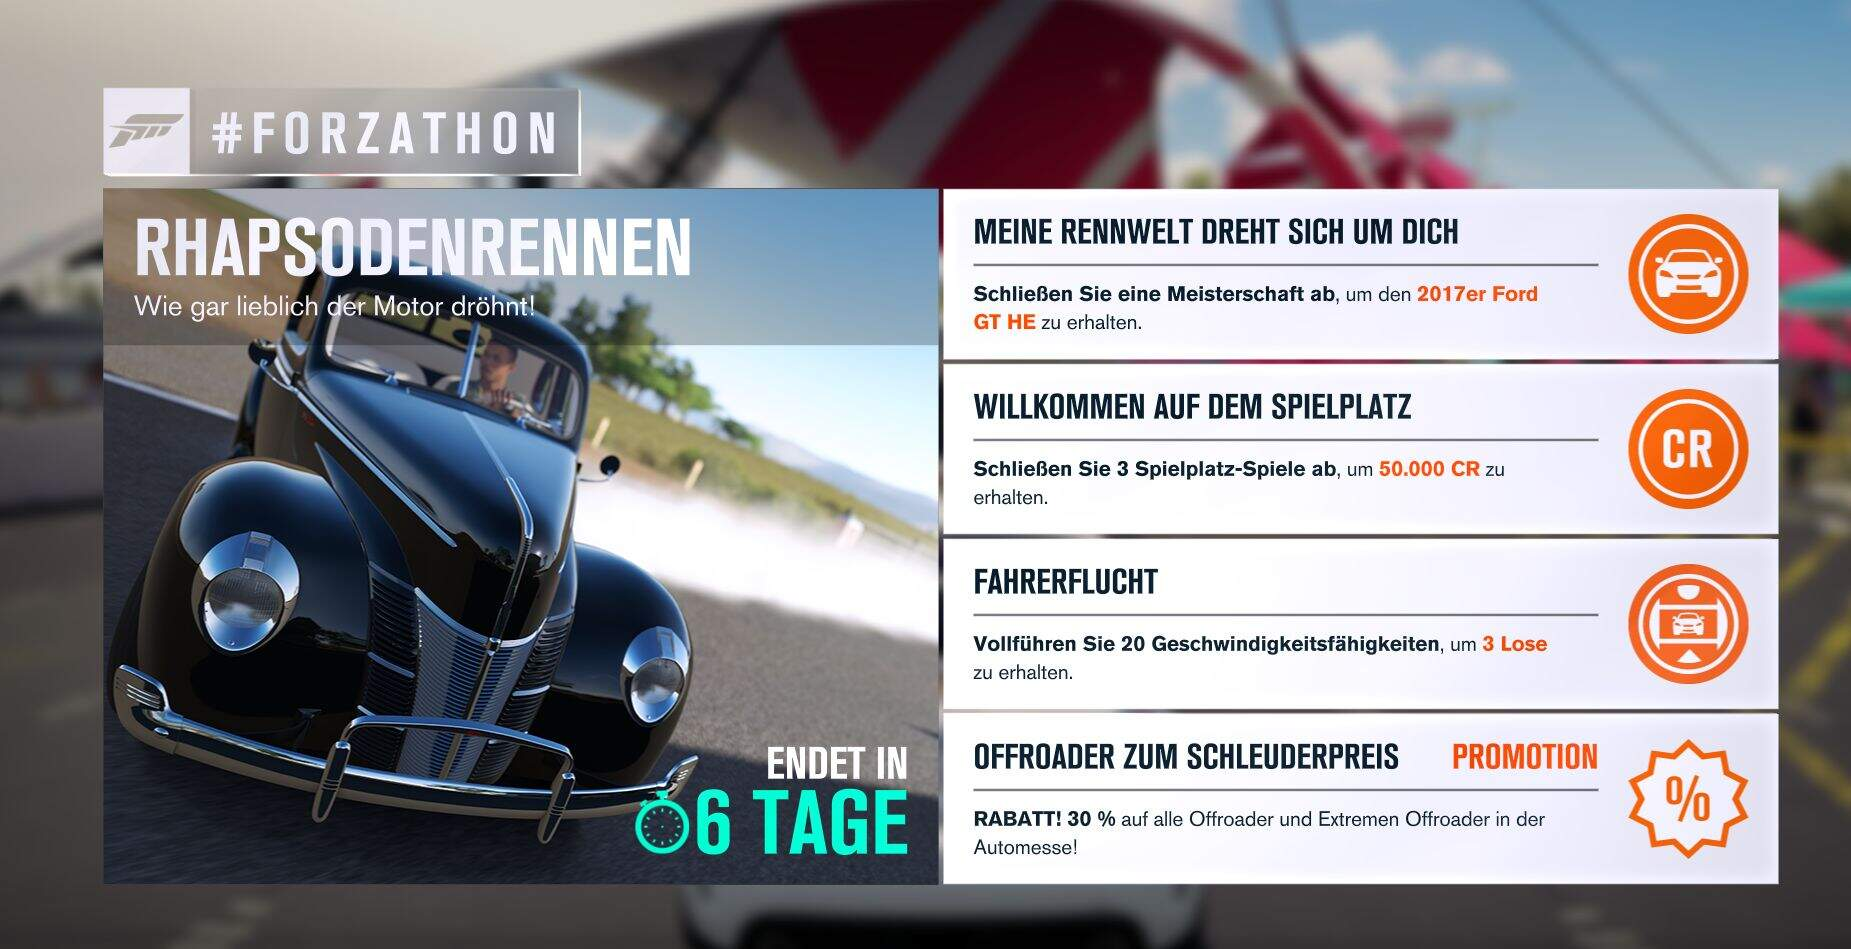 Forza Horizon 3 #Forzathon Guide KW 35 – Rhapsodenrennen